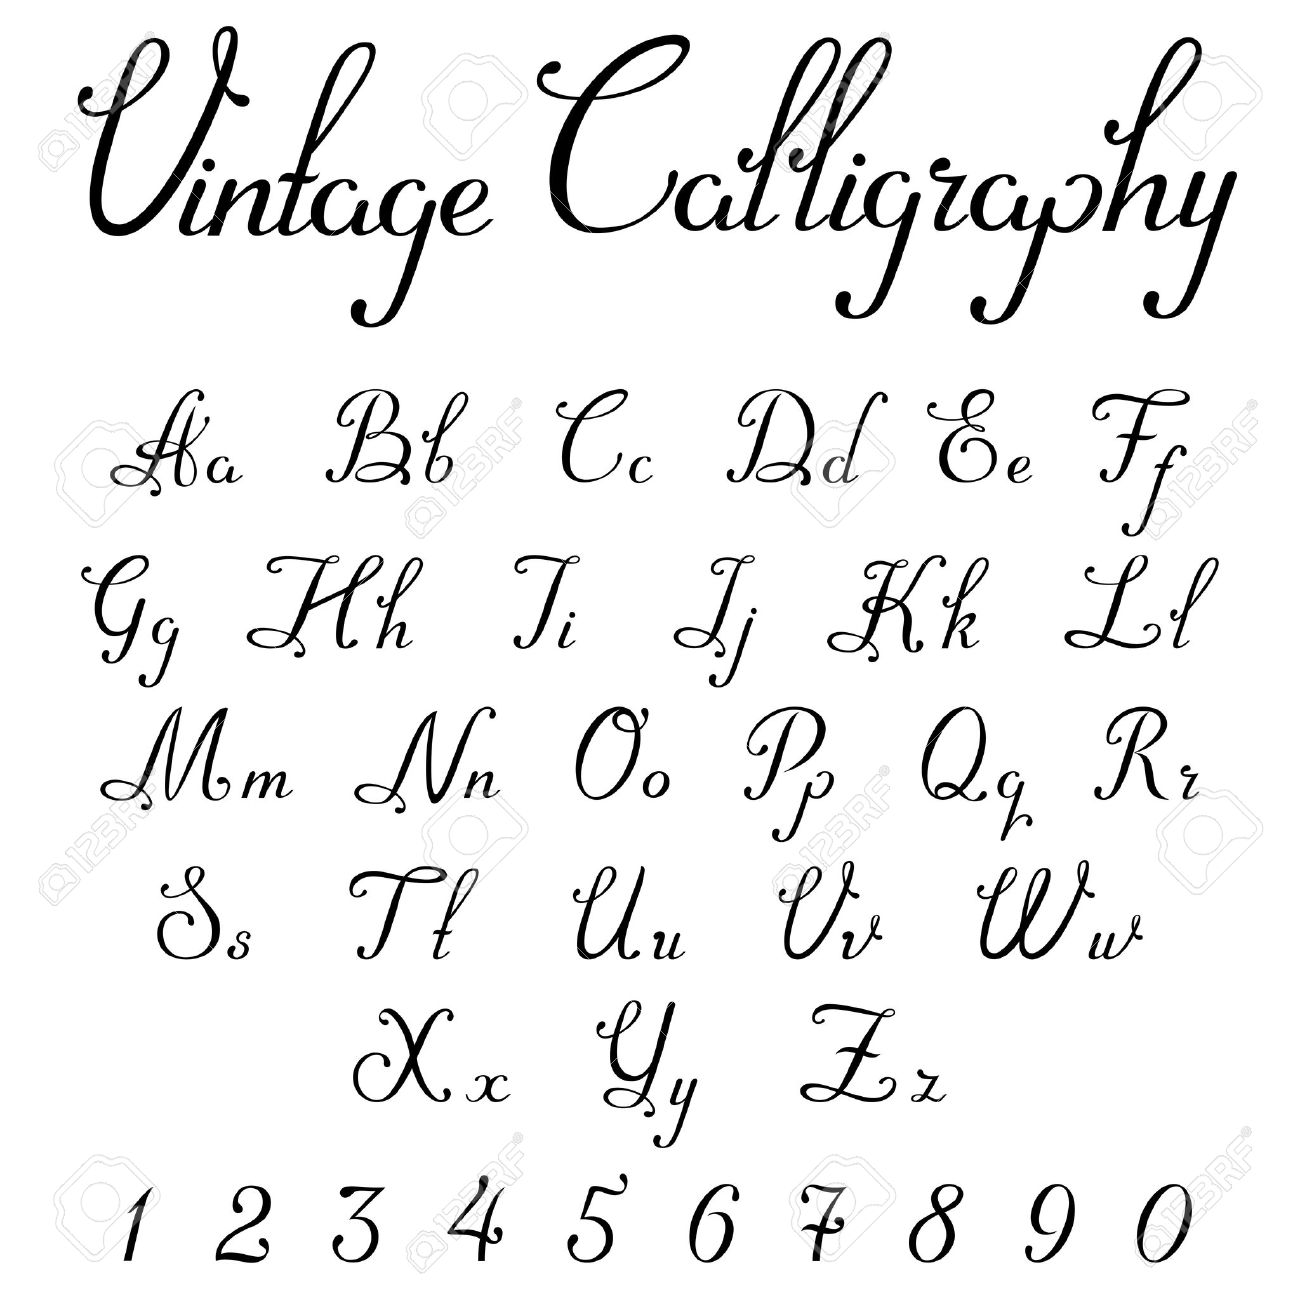 Vintage Calligraphic Script Font Linear Vector Handmade Calligraphy